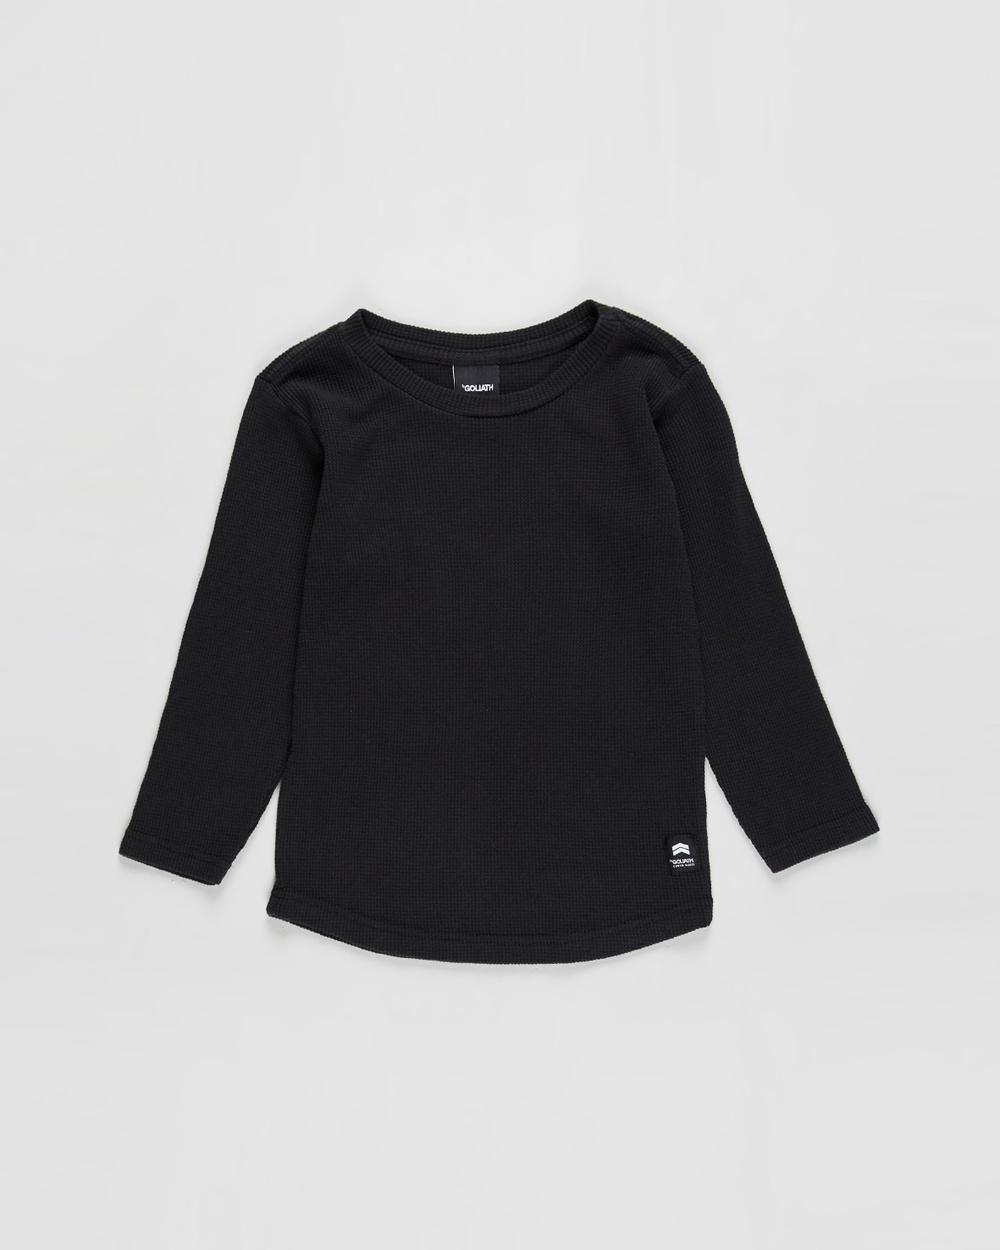 St Goliath - Long Sleeve Waffle Tee   Kids - T-Shirts & Singlets (Black) Long Sleeve Waffle Tee - Kids